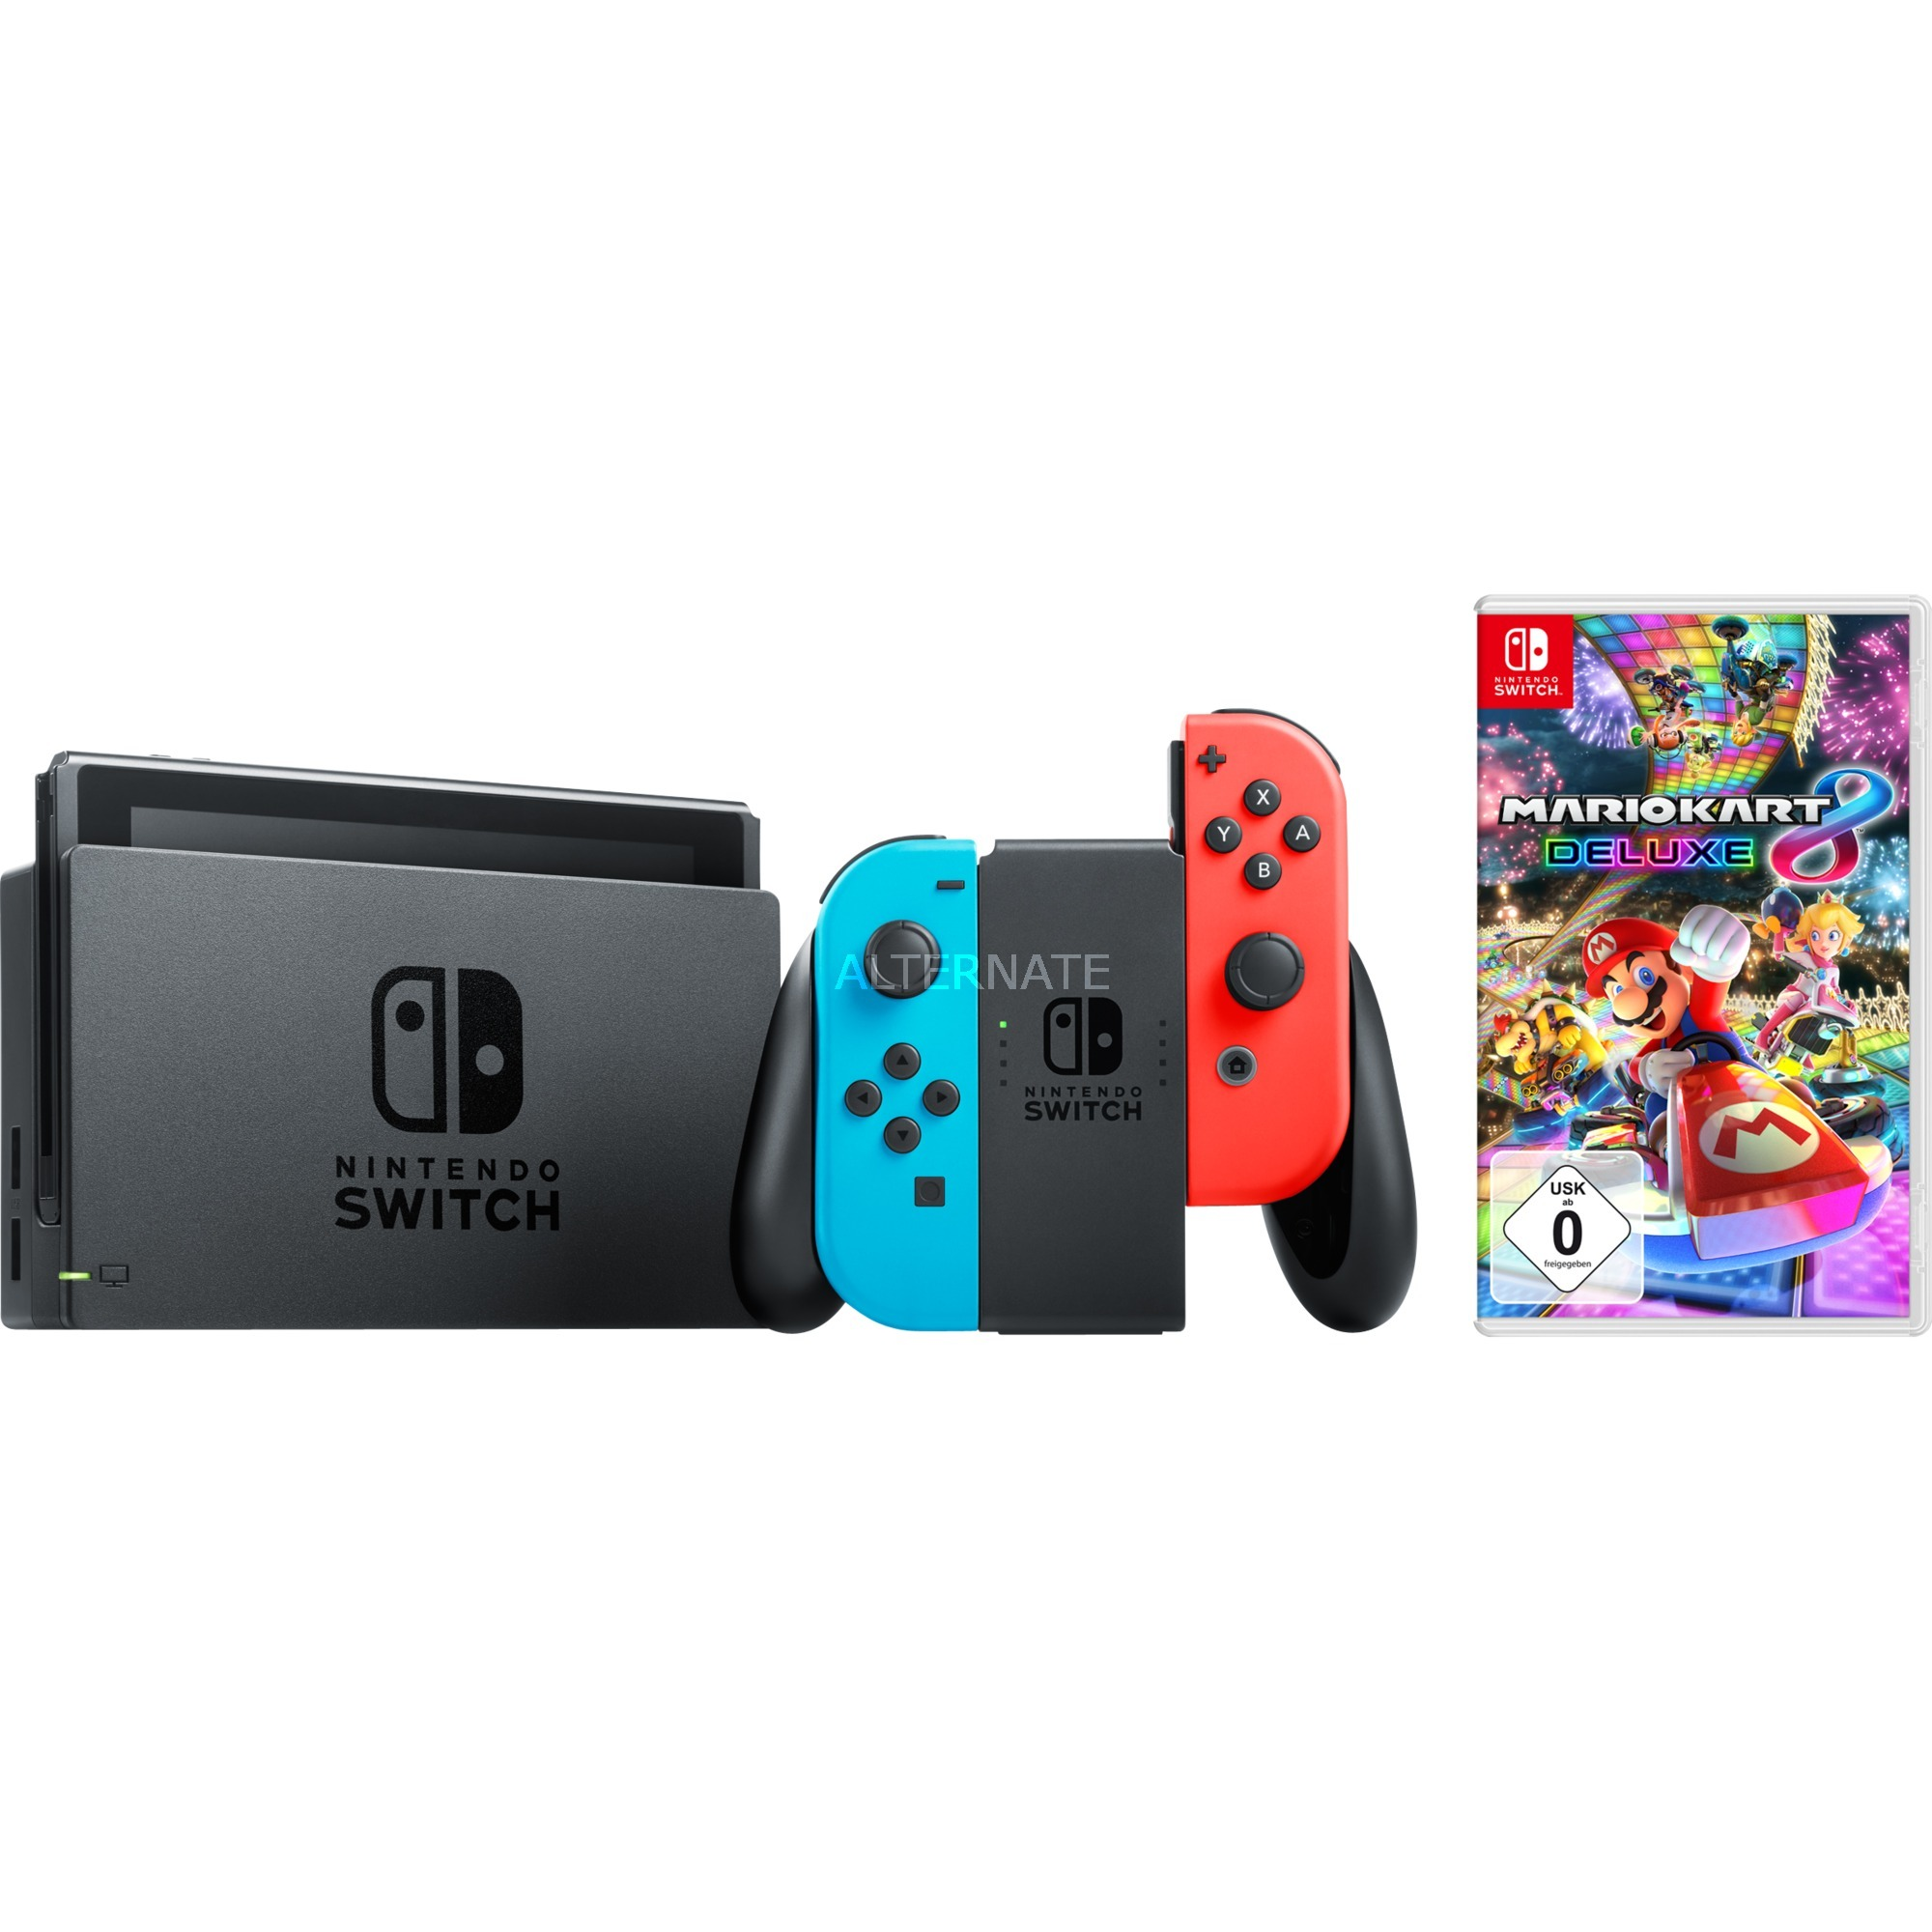 Switch + Mario Kart 8, Videoconsola